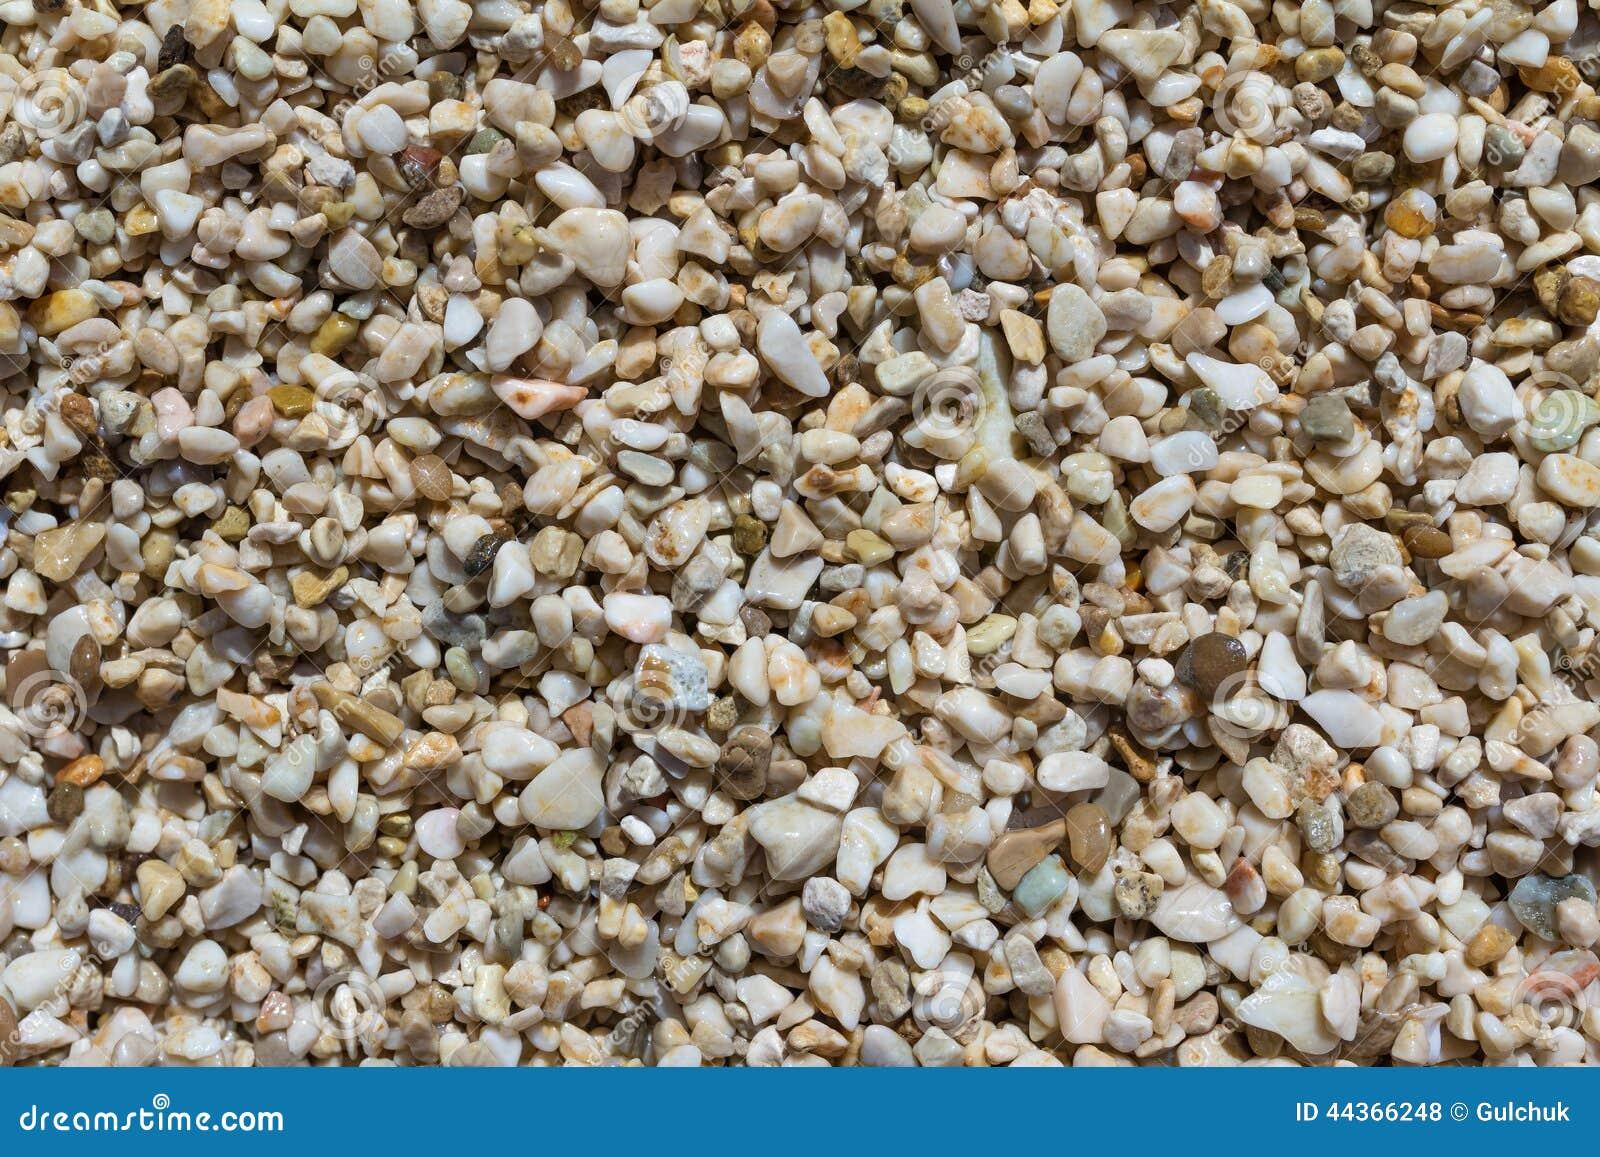 Pietre bagnate su una spiaggia